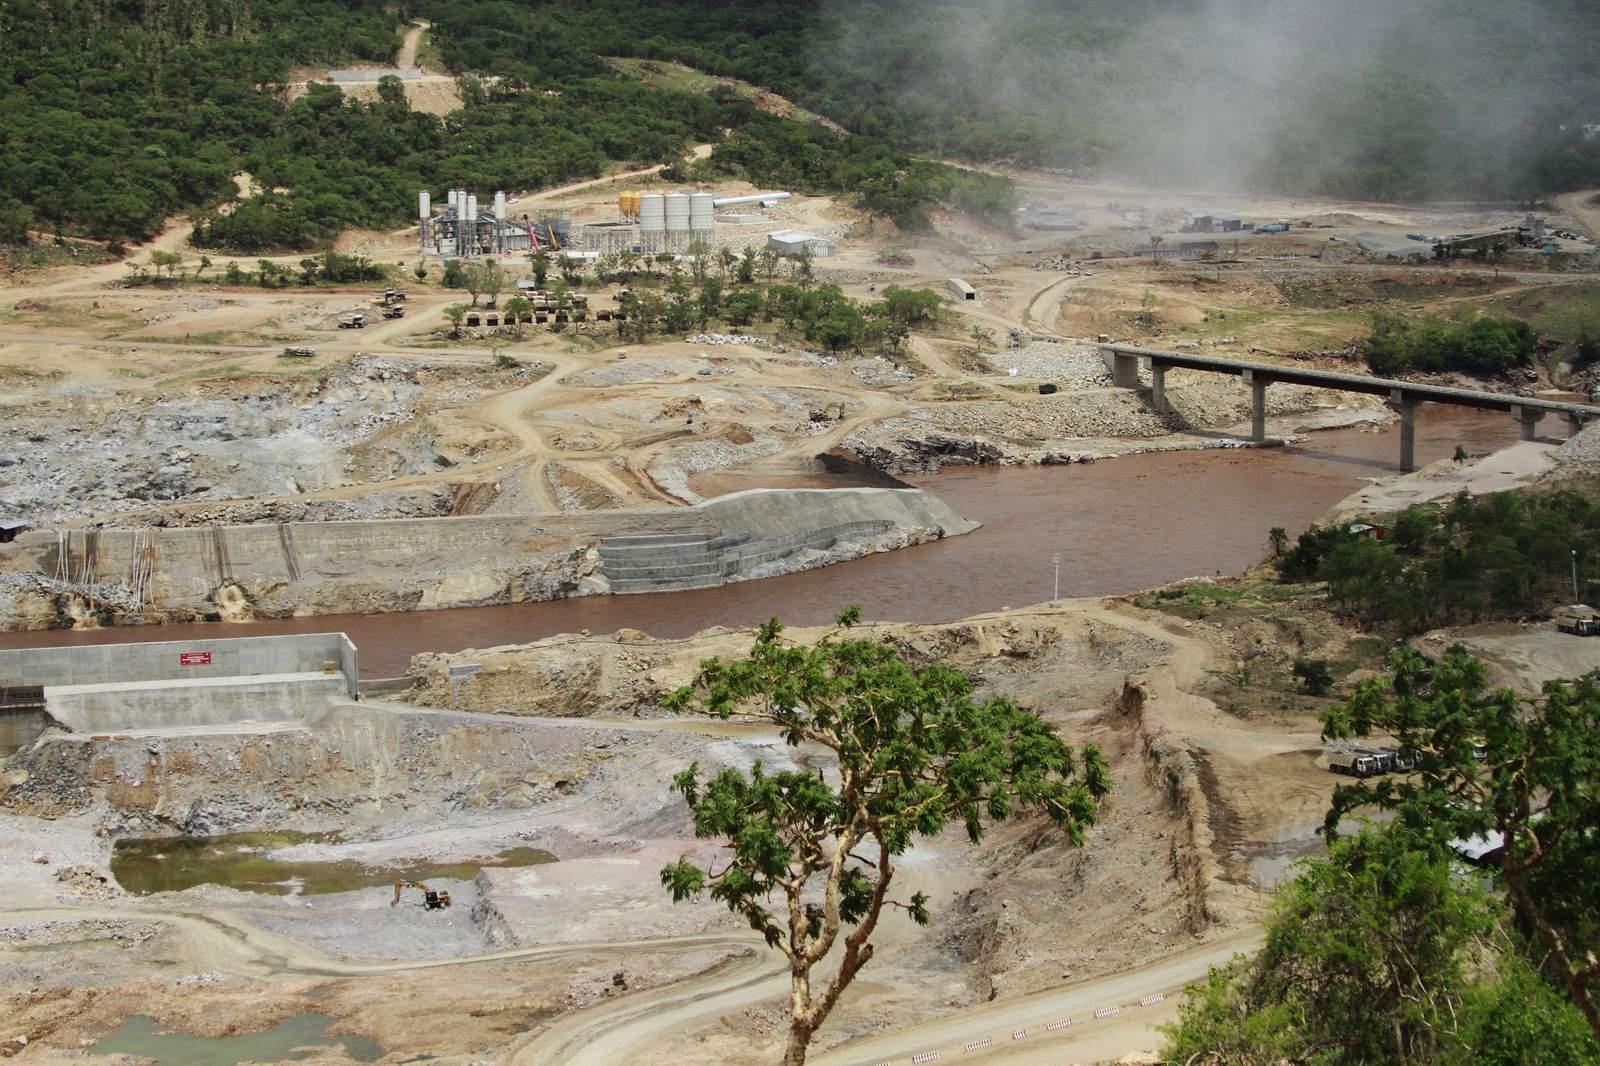 3 African nations reach preliminary deal in Nile dam dispute - WKMG News 6 & ClickOrlando